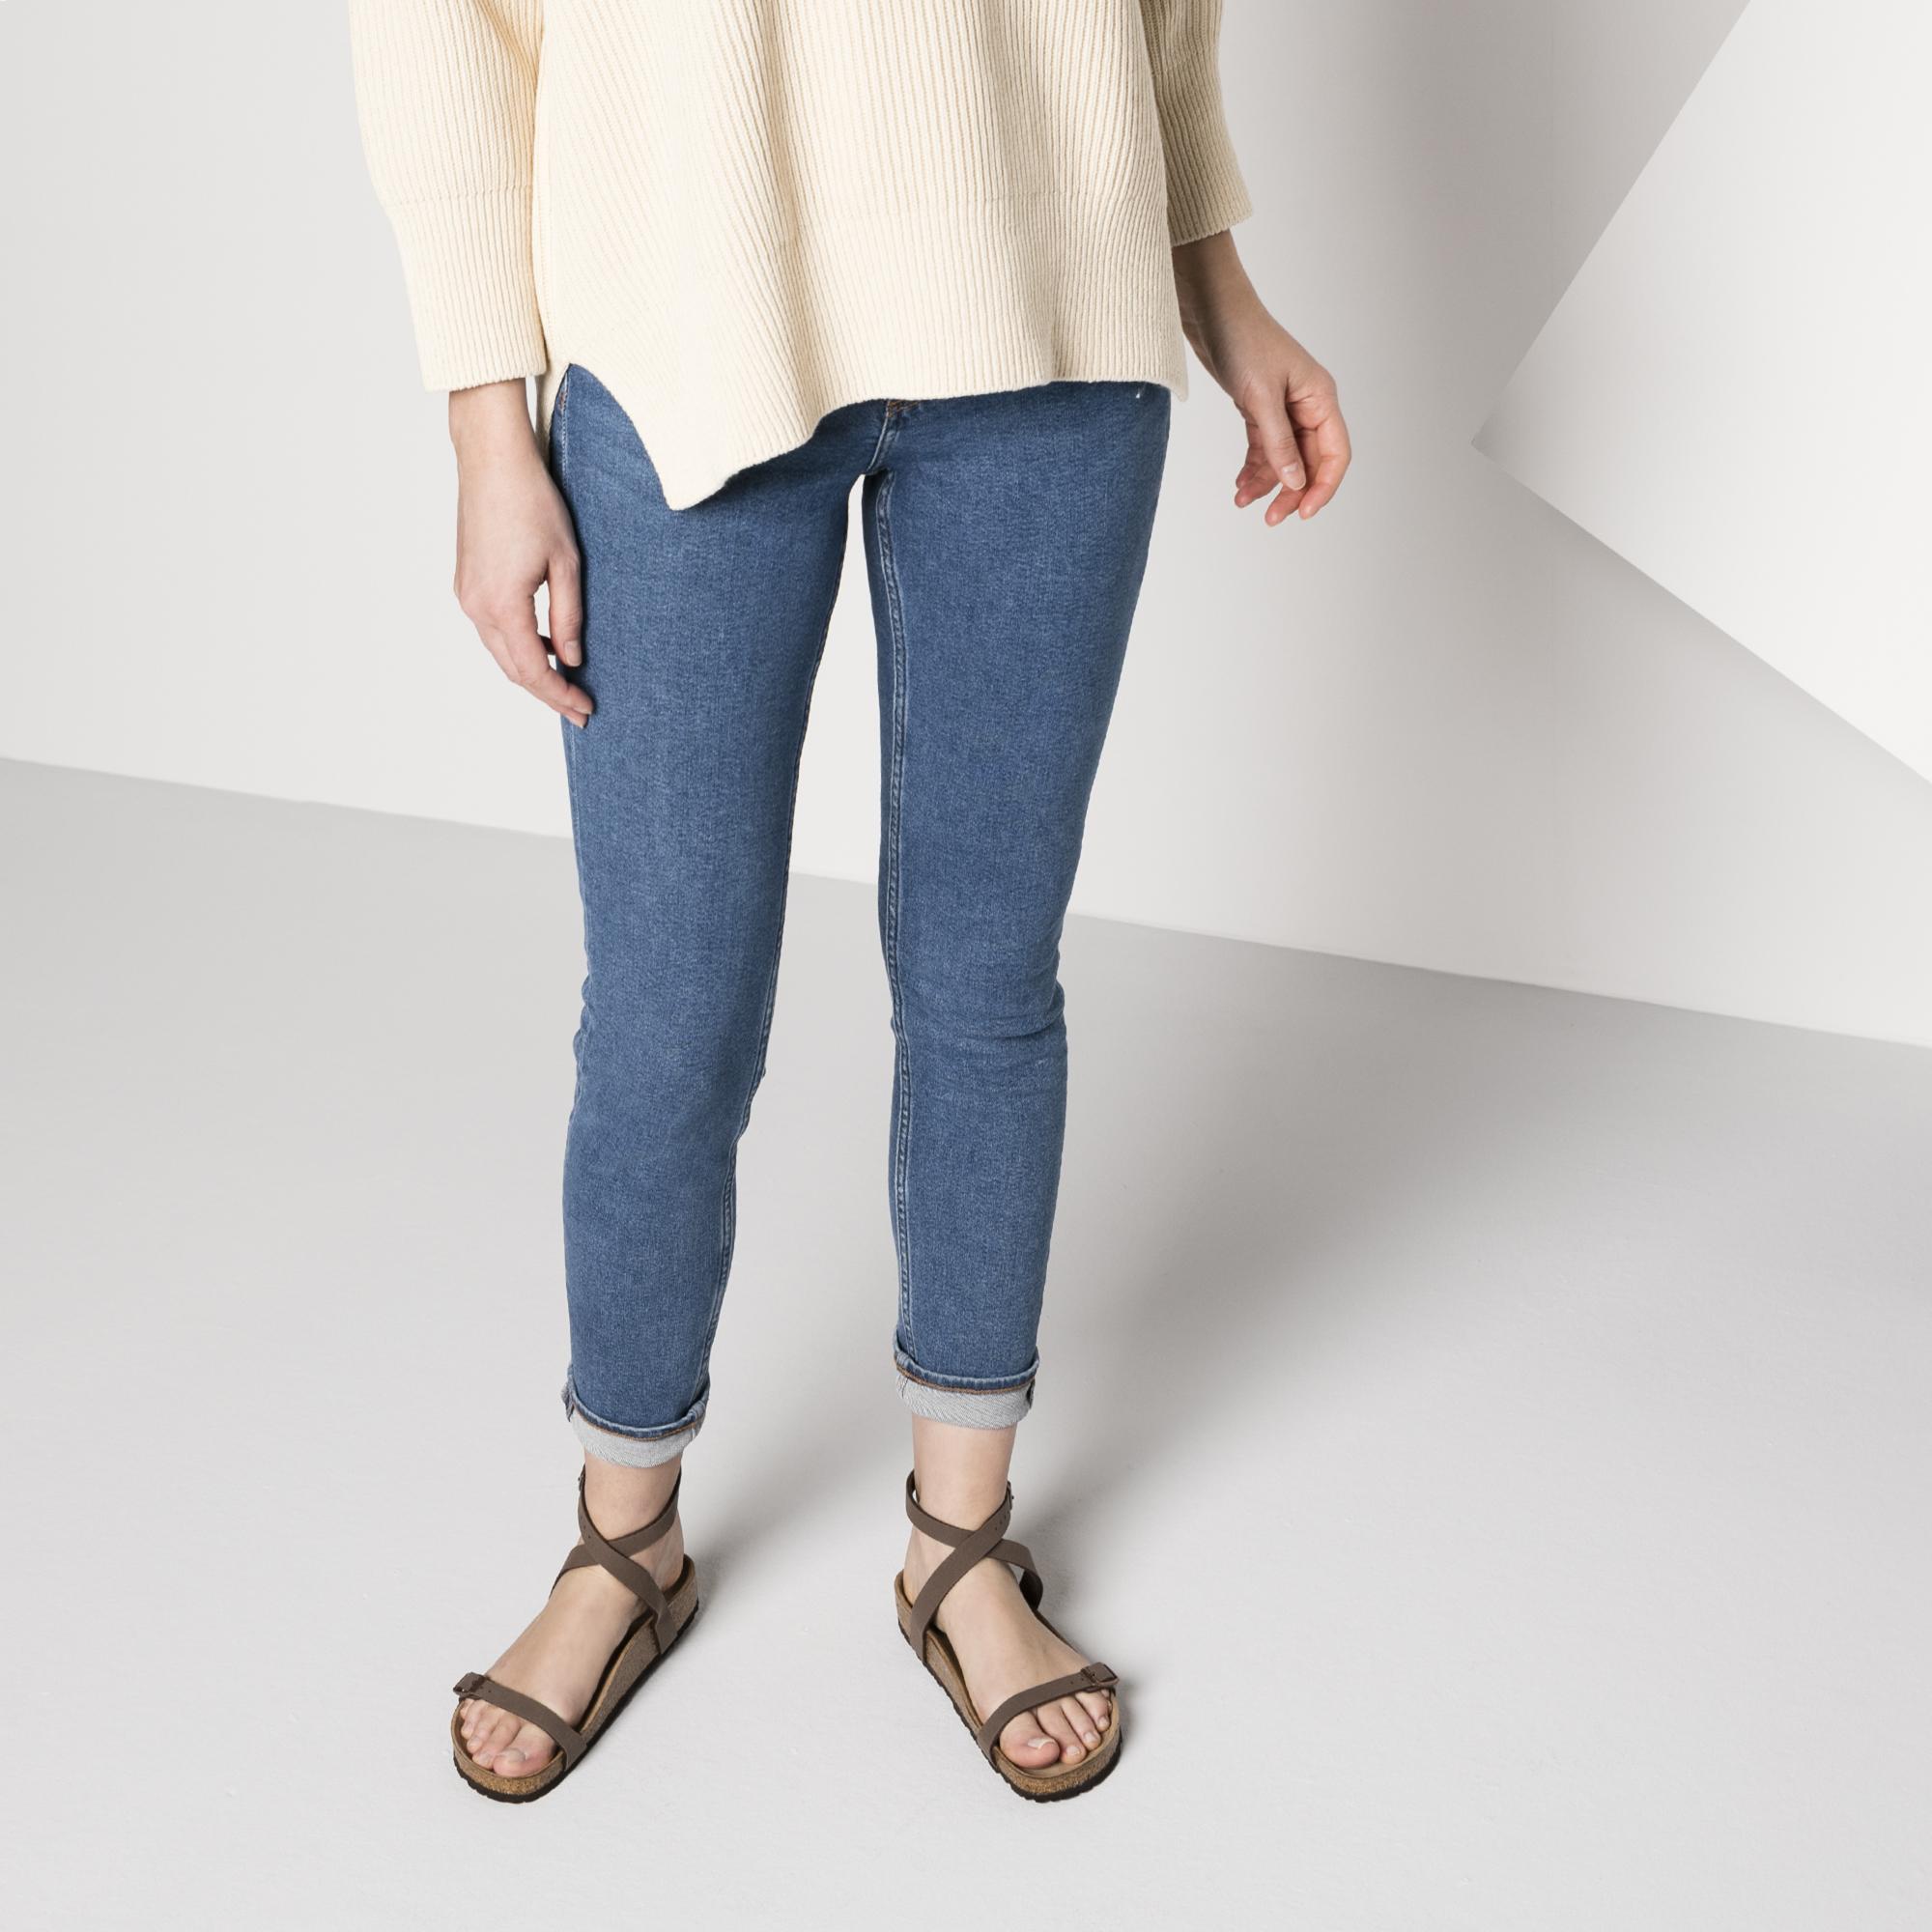 Shop Birkenstock Daloa Ankle Strap Sandal In Mocha